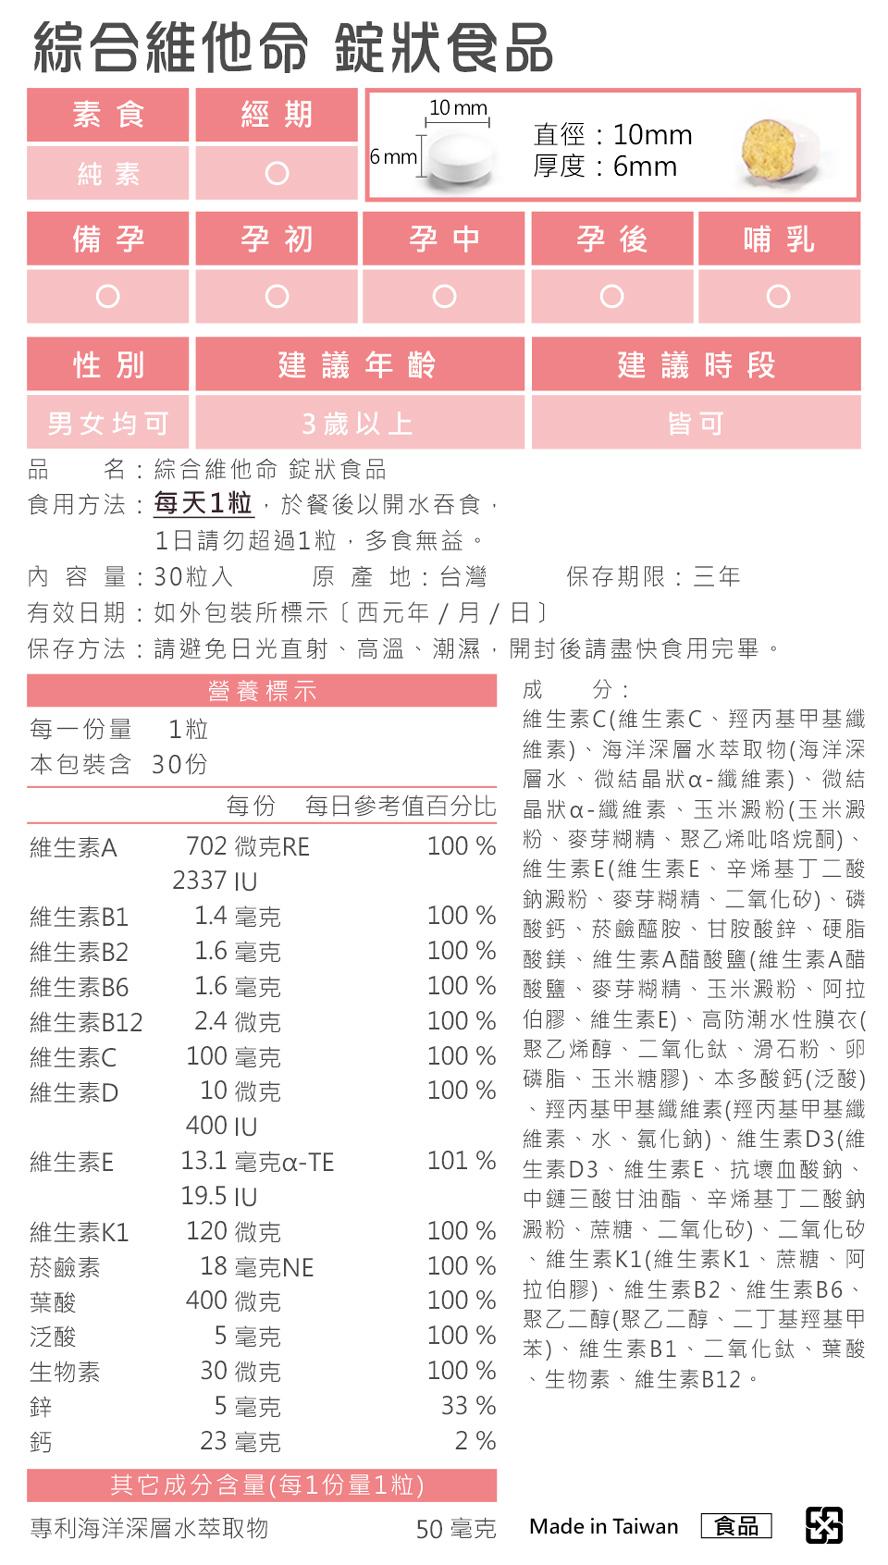 BHK's限量Hello Kitty綜合維他命絕對足量,並擁有13種維生素+豐富礦物質,每日一粒滋補便利。